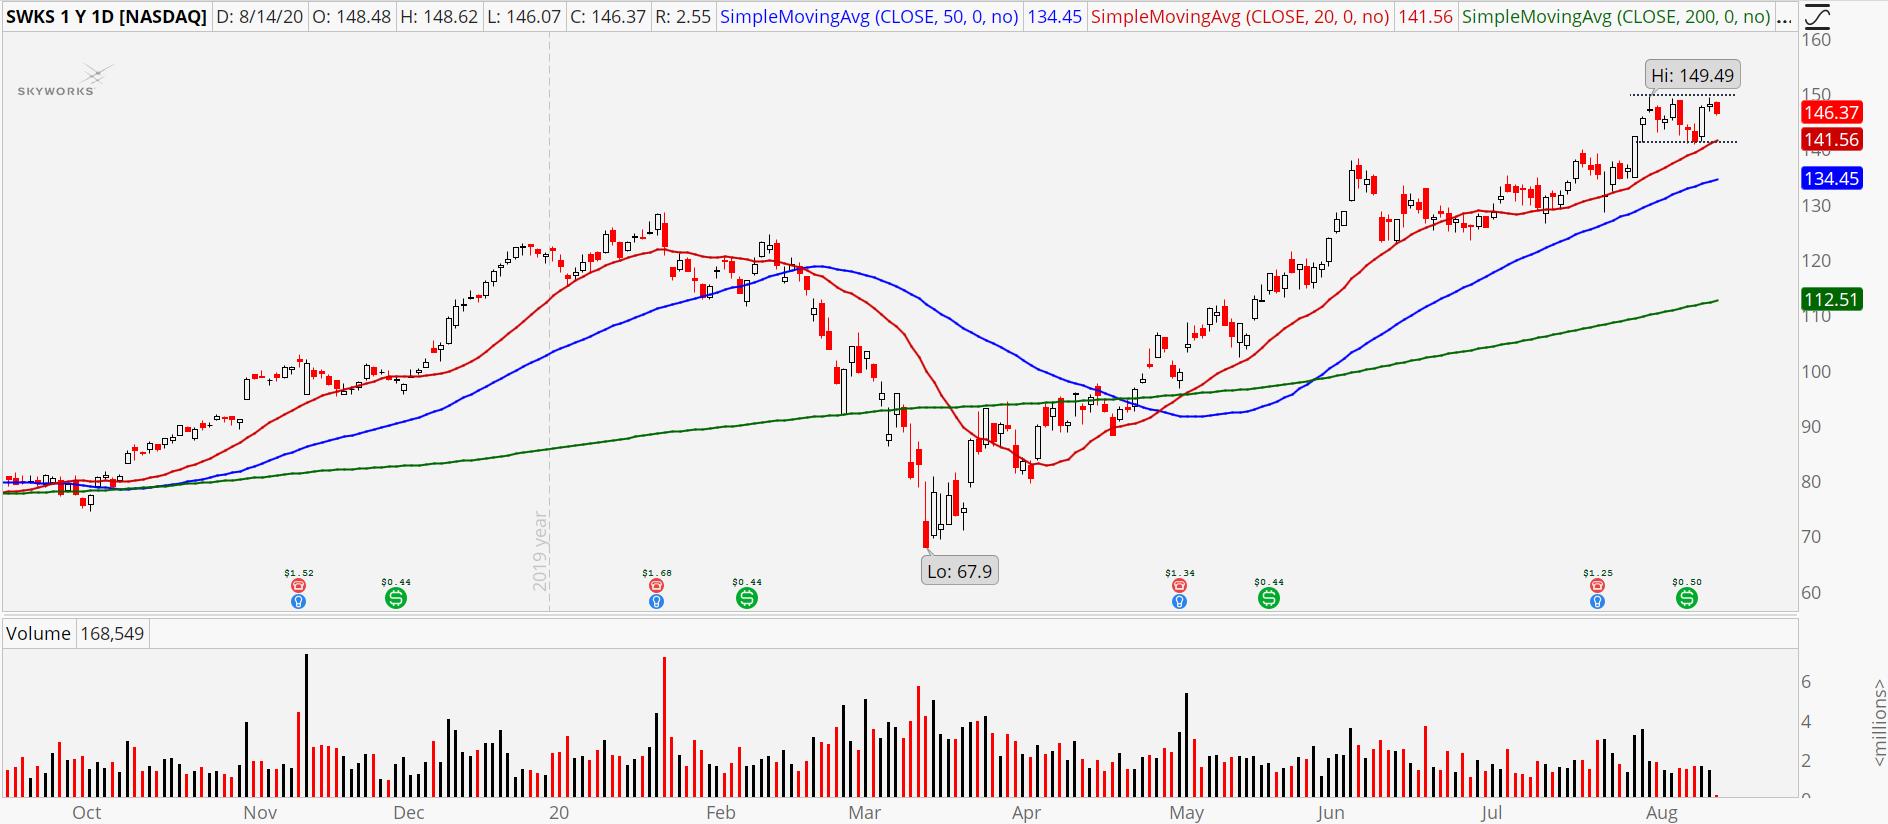 Skyworks (SWKS) stock showing high base breakout